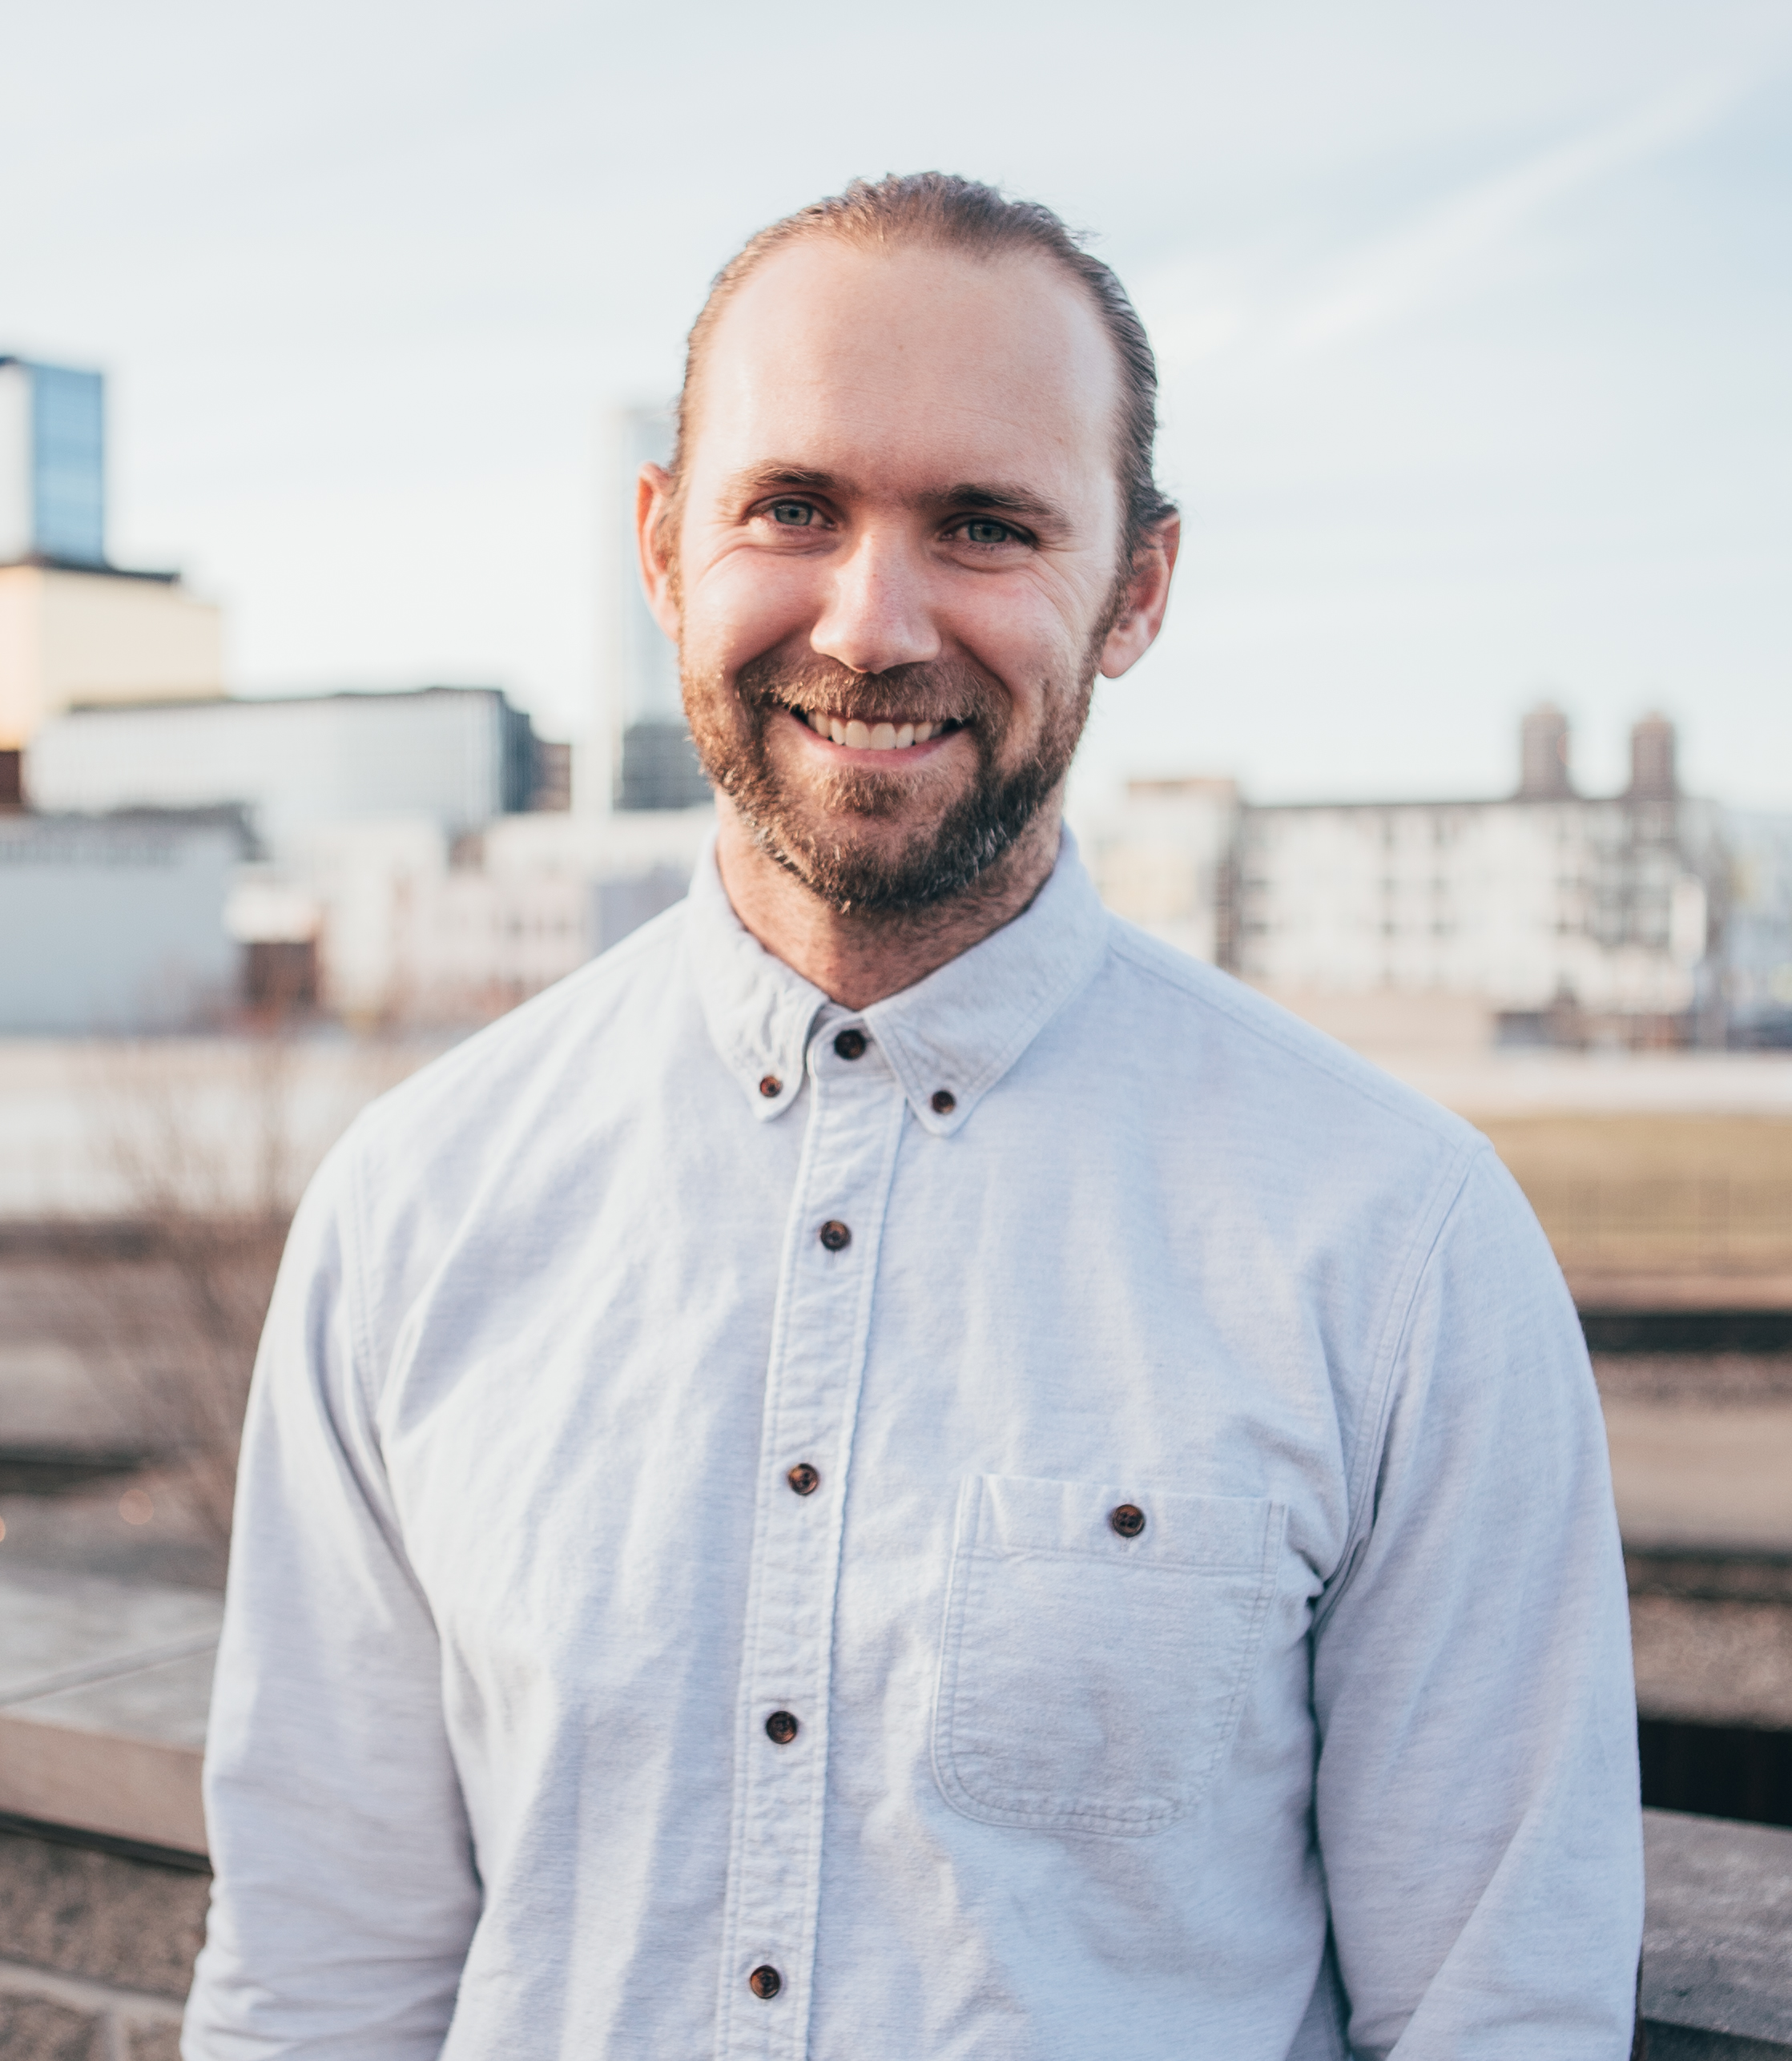 Jared Byczko @jabyczko Interviewer / Co- Founder / COO